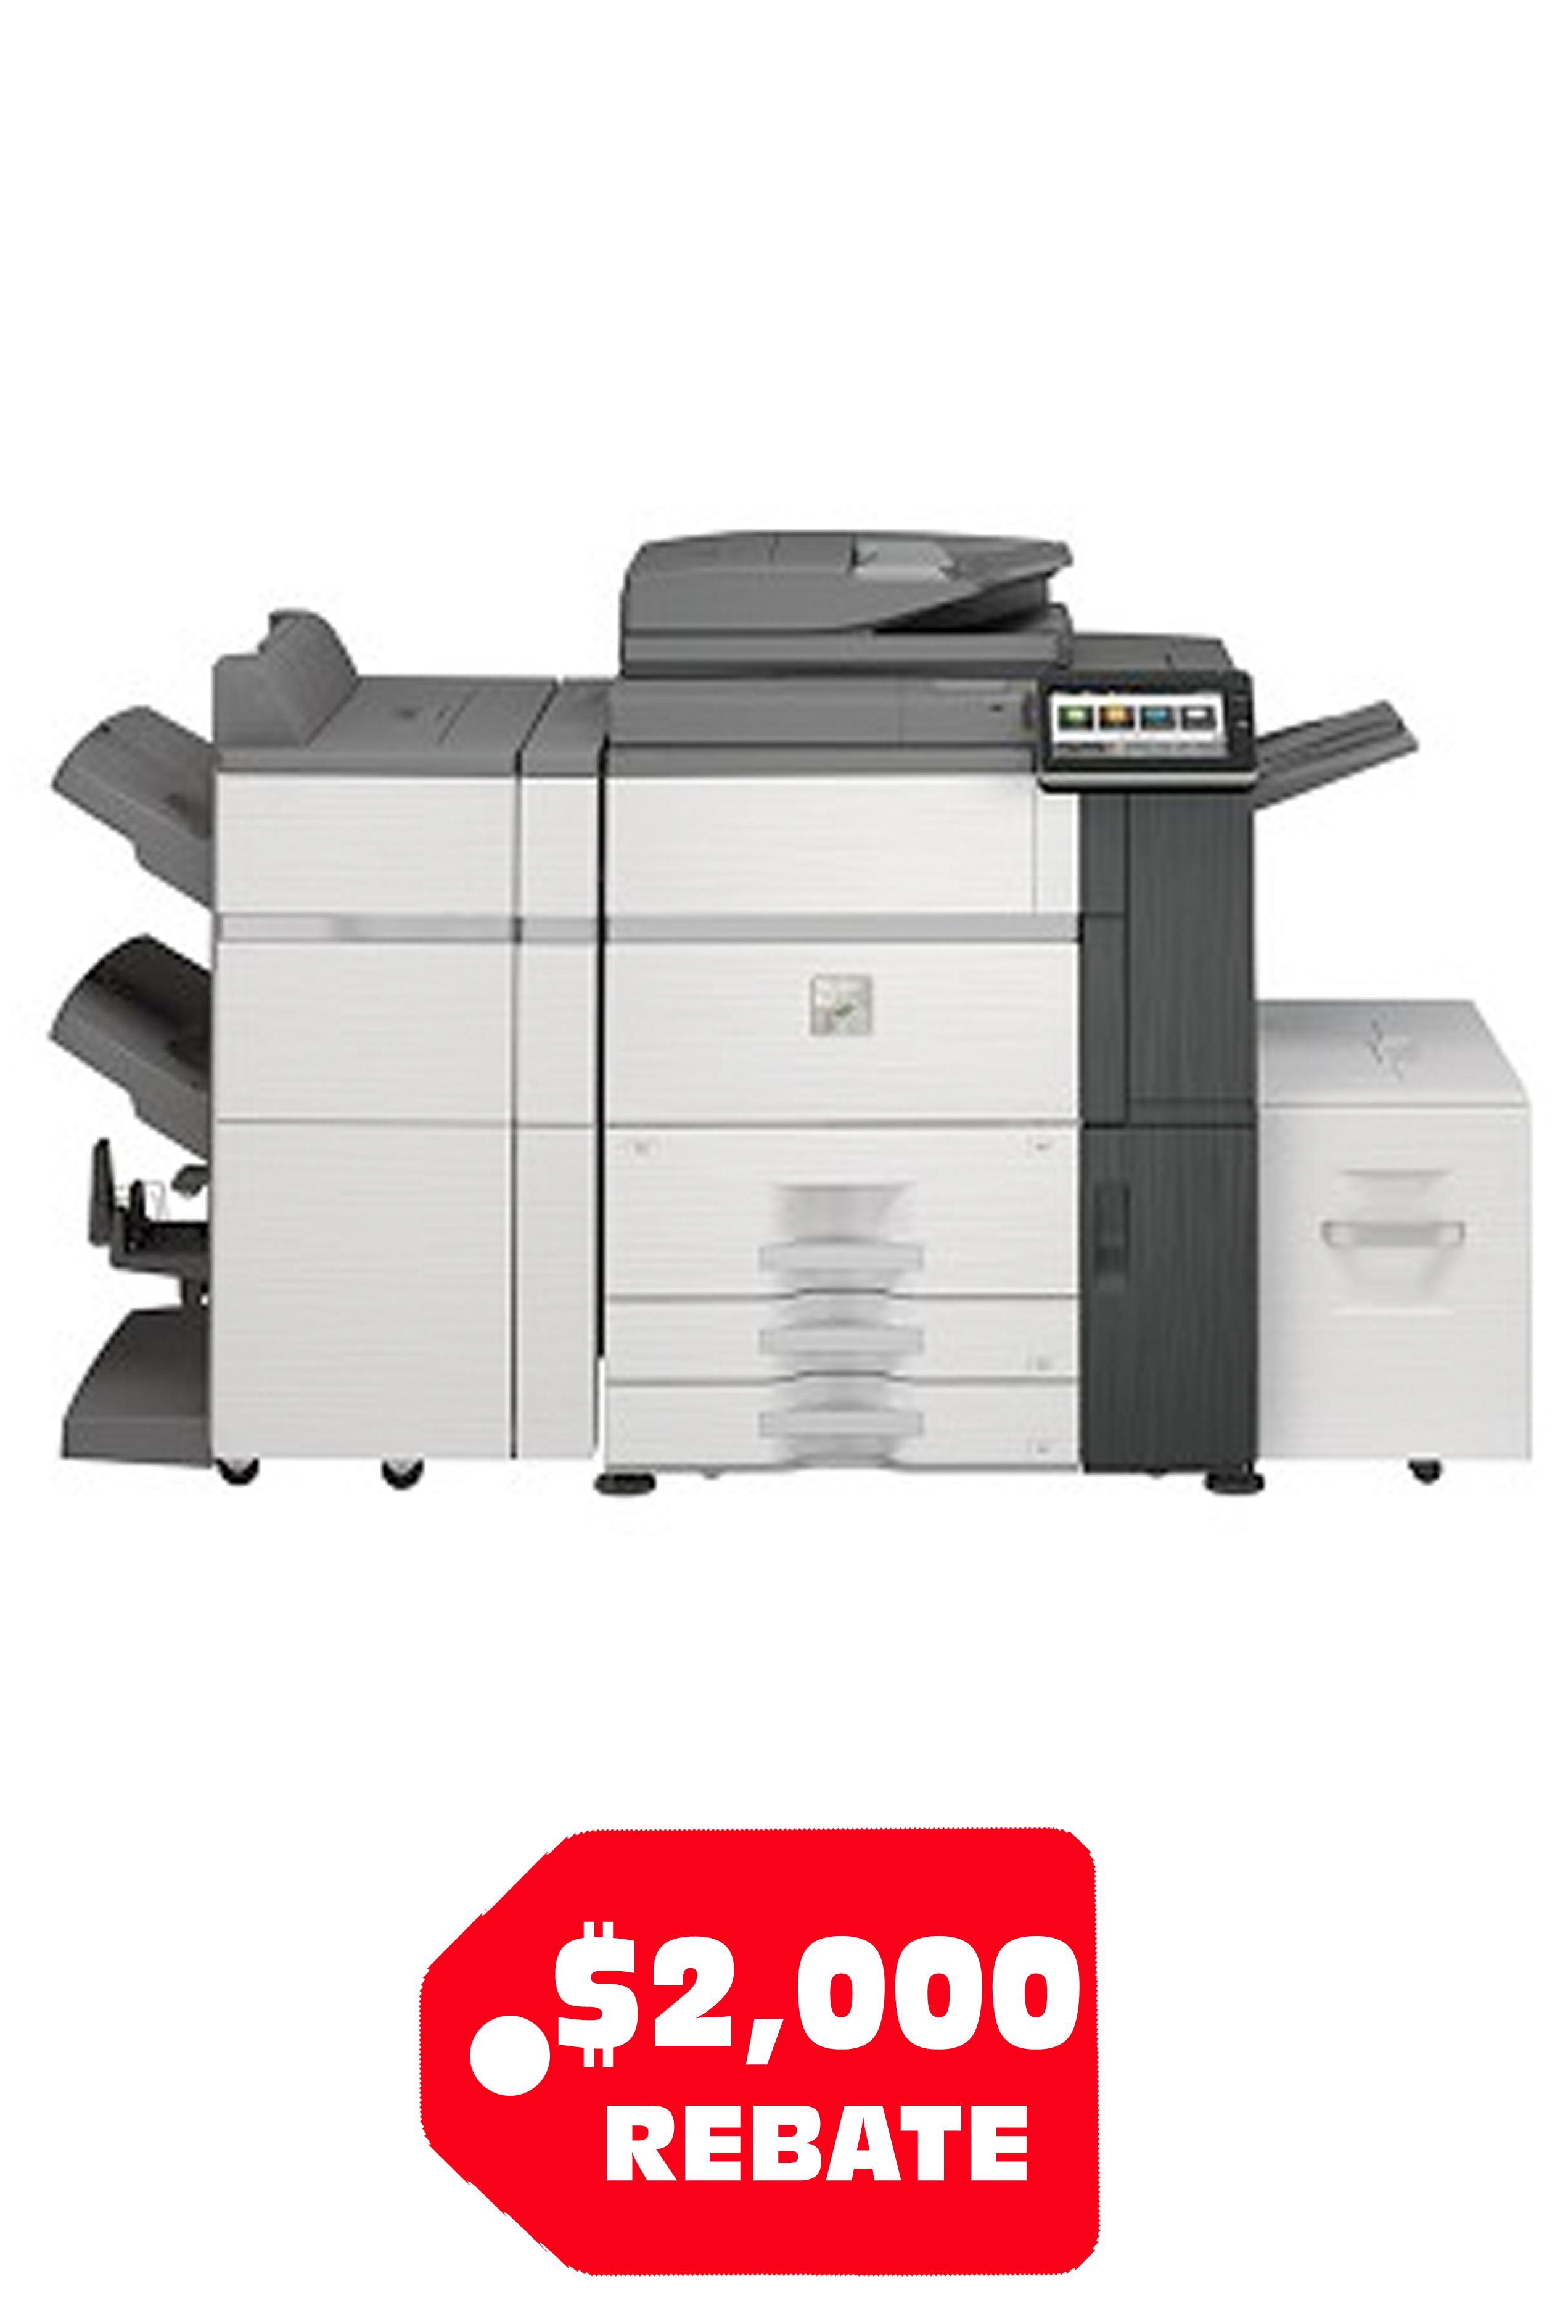 Sharp SHARP MX-7580N High Speed Color Document (75ppm/75ppm)